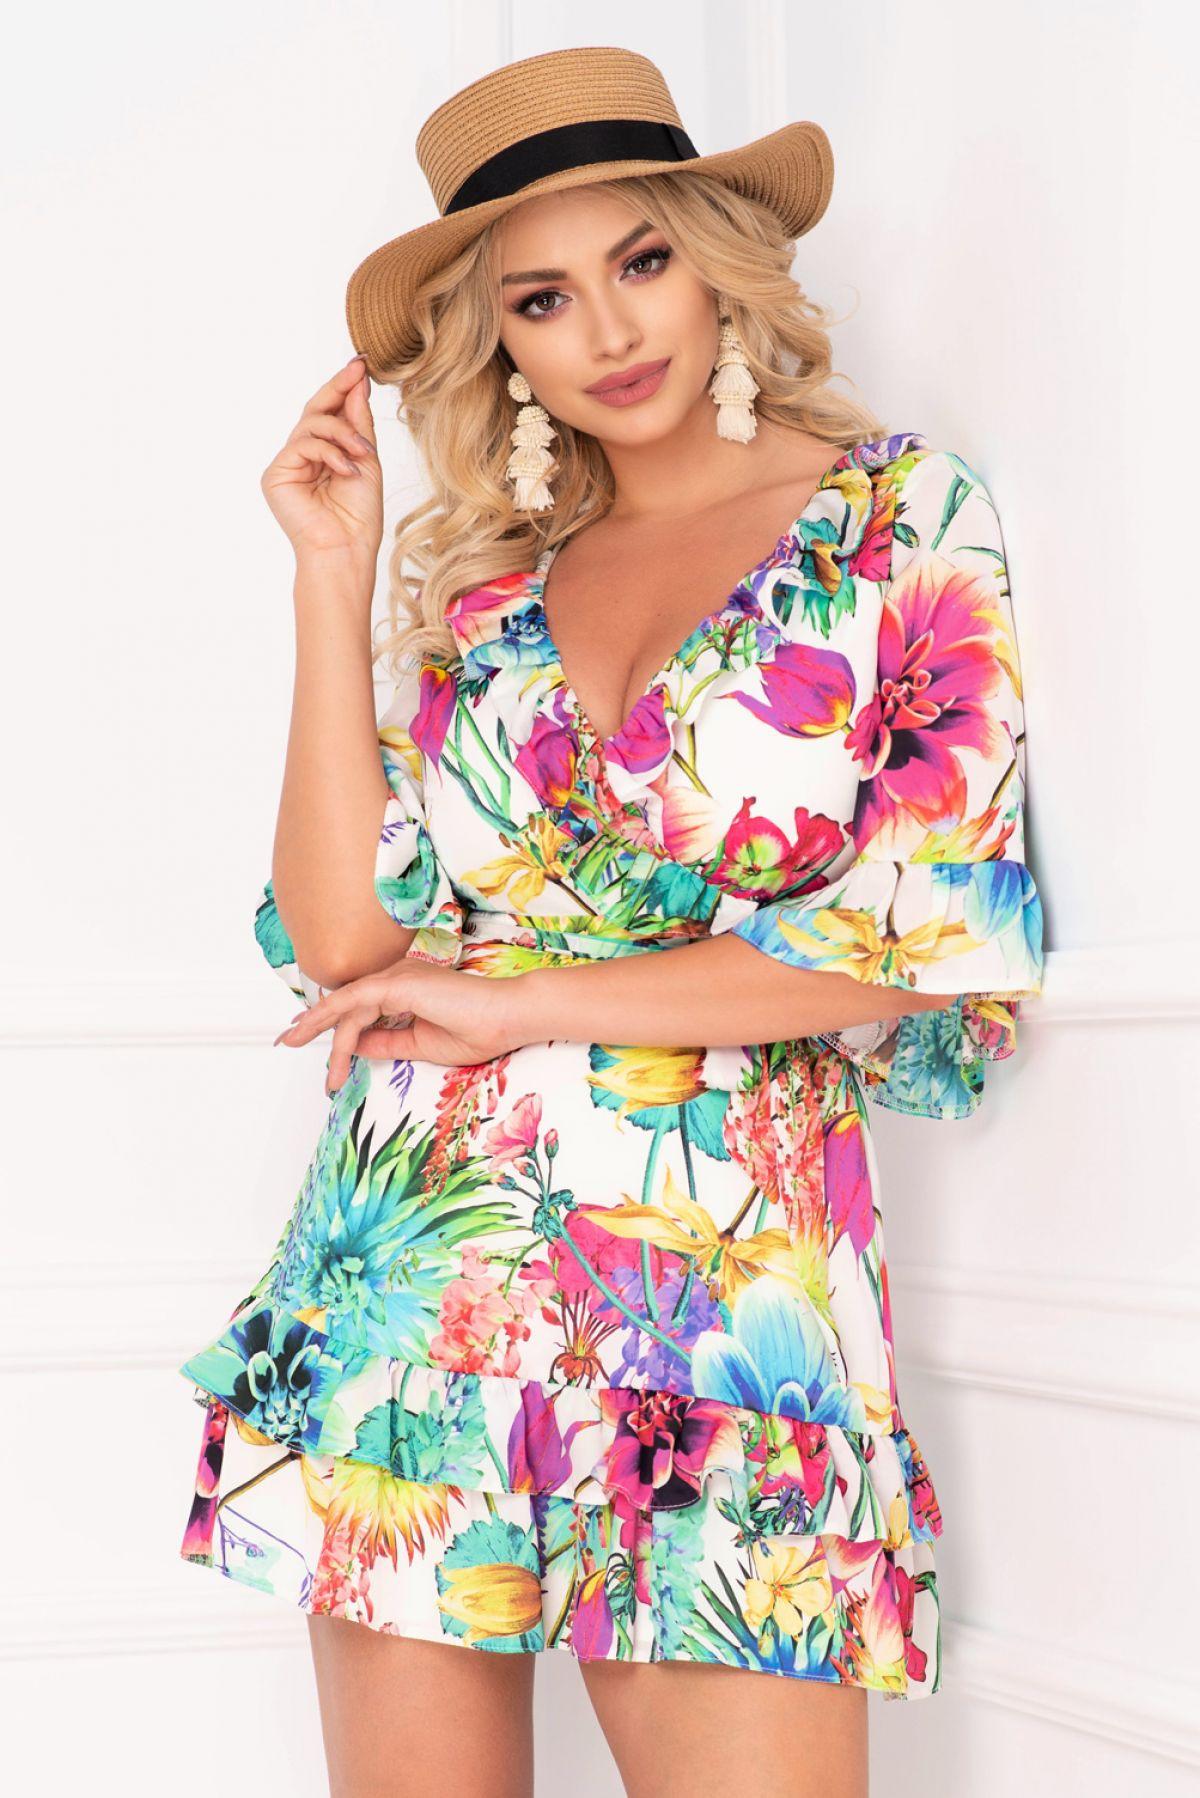 Rochie Artista de vara cu imprimeu floral colorat Artista-Fashion